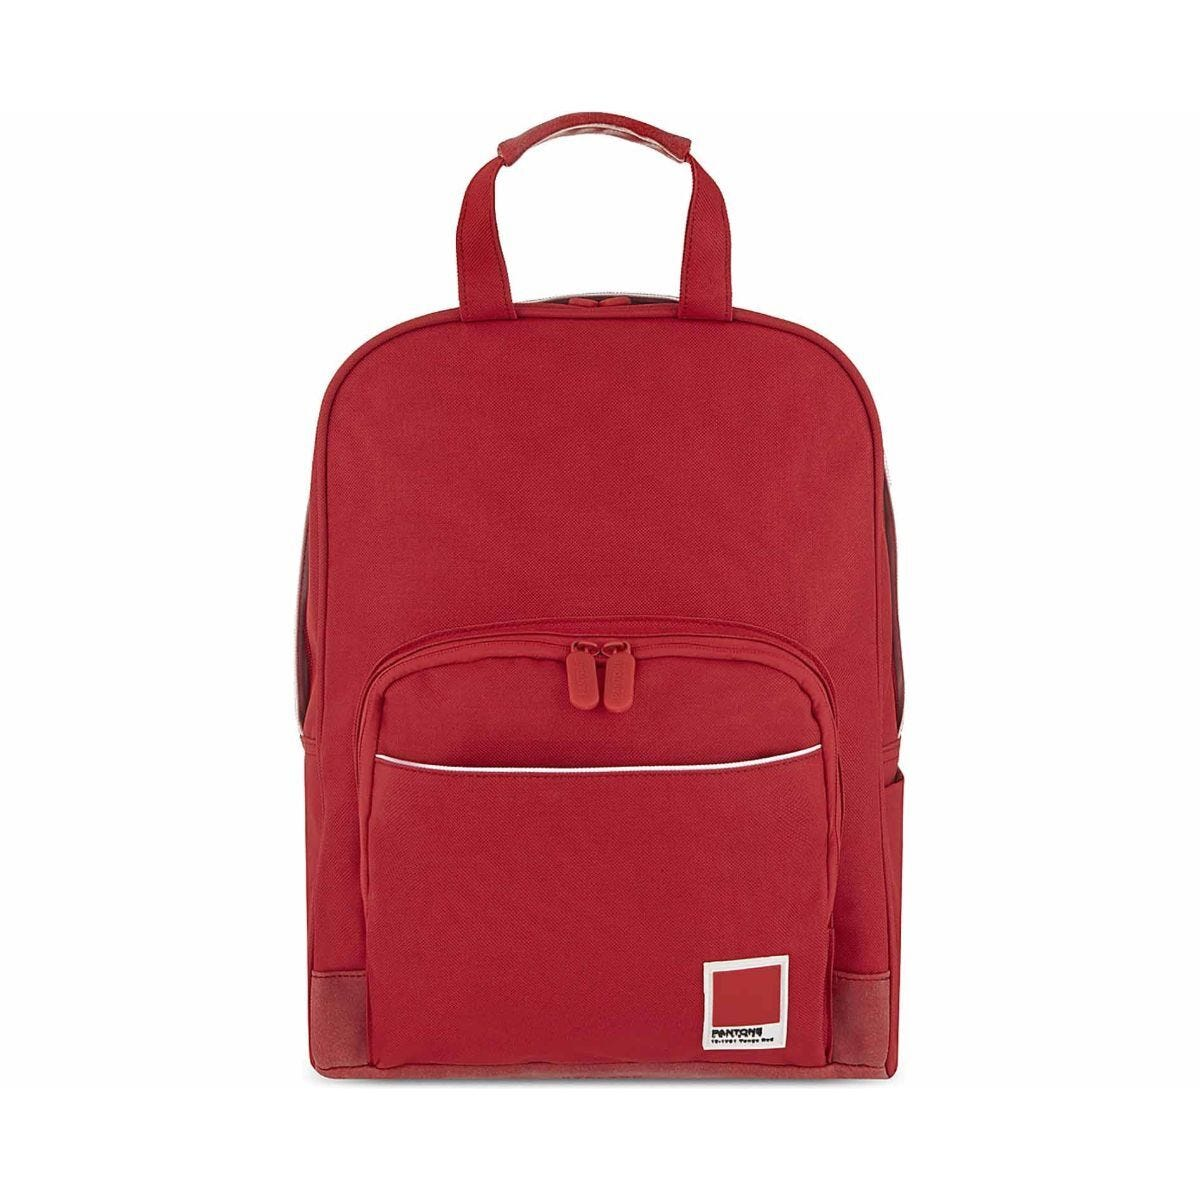 Pantone Laptop Backpack Medium Tango Red